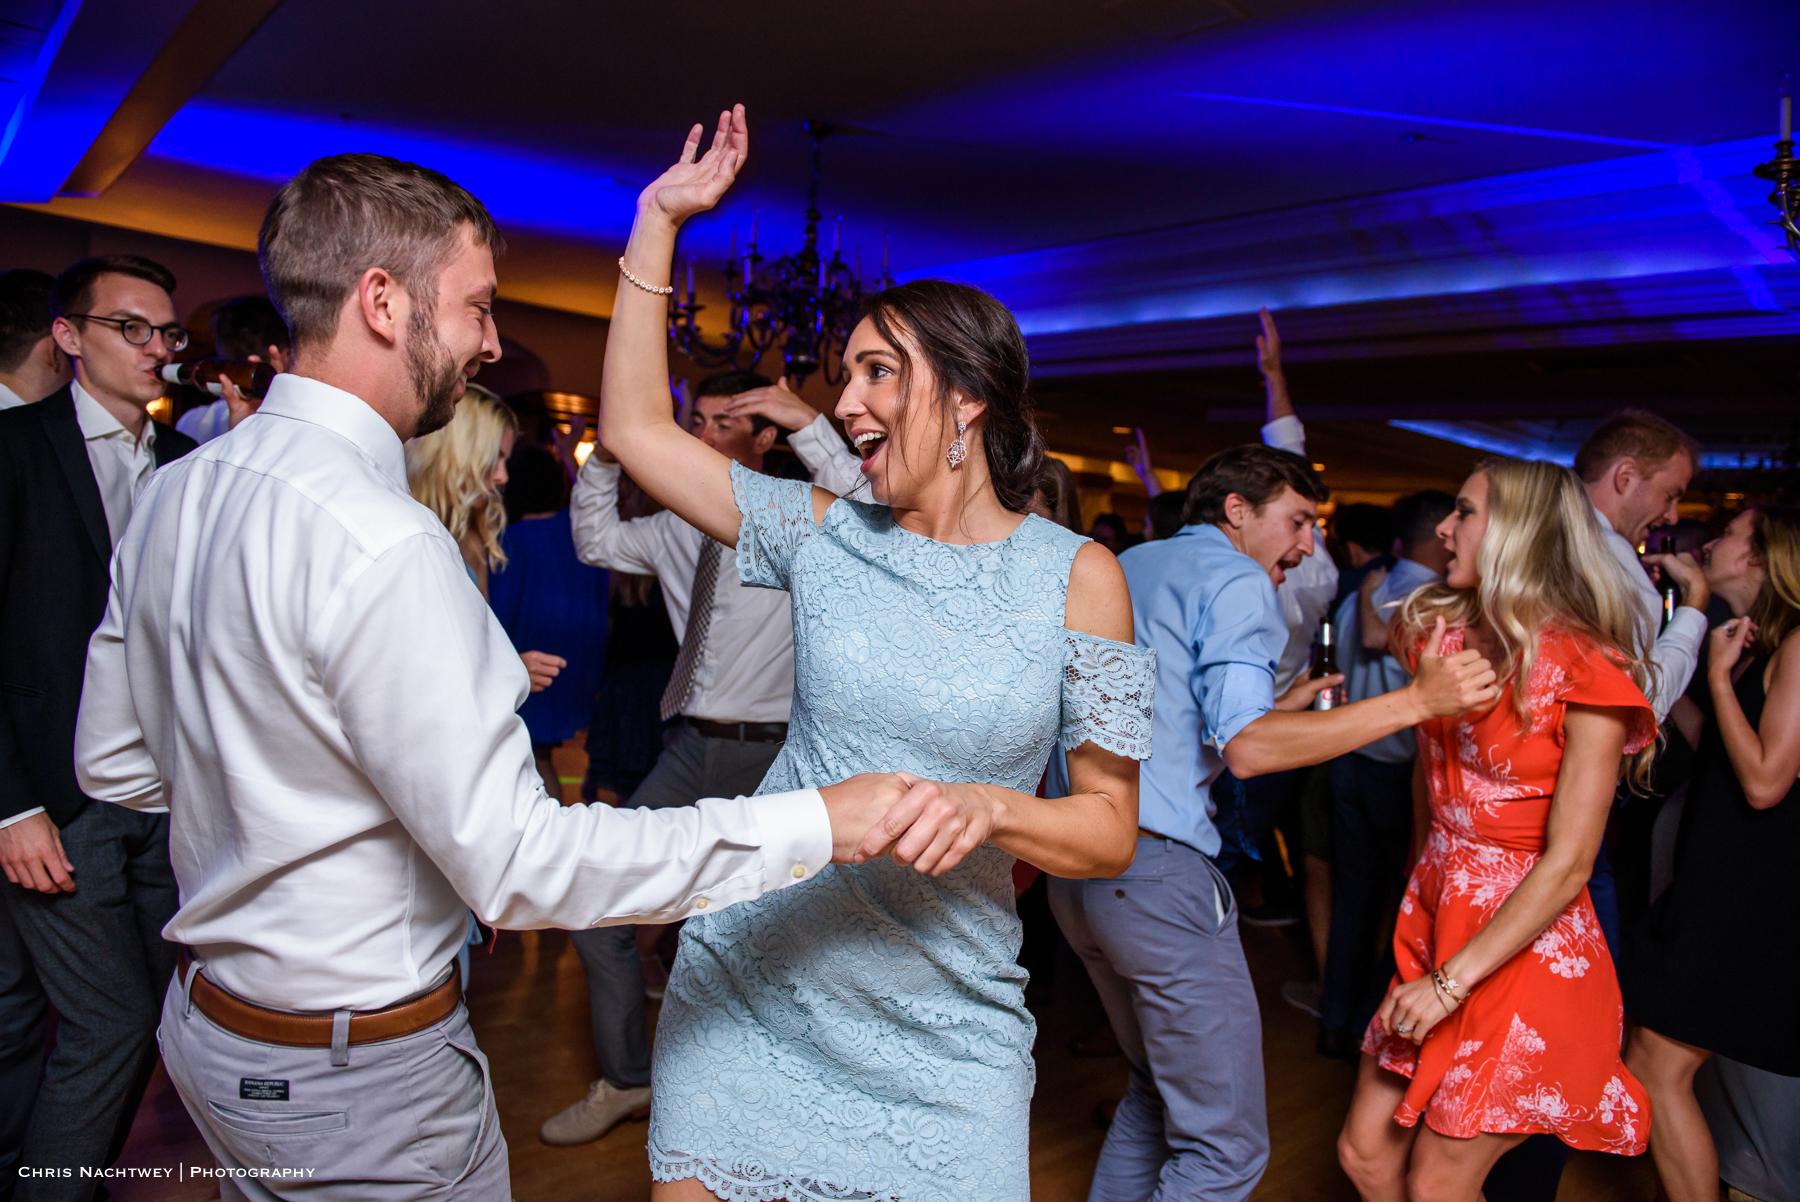 photos-wedding-quidnessett-country-club-ri-chris-nachtwey-photography-2018-57.jpg